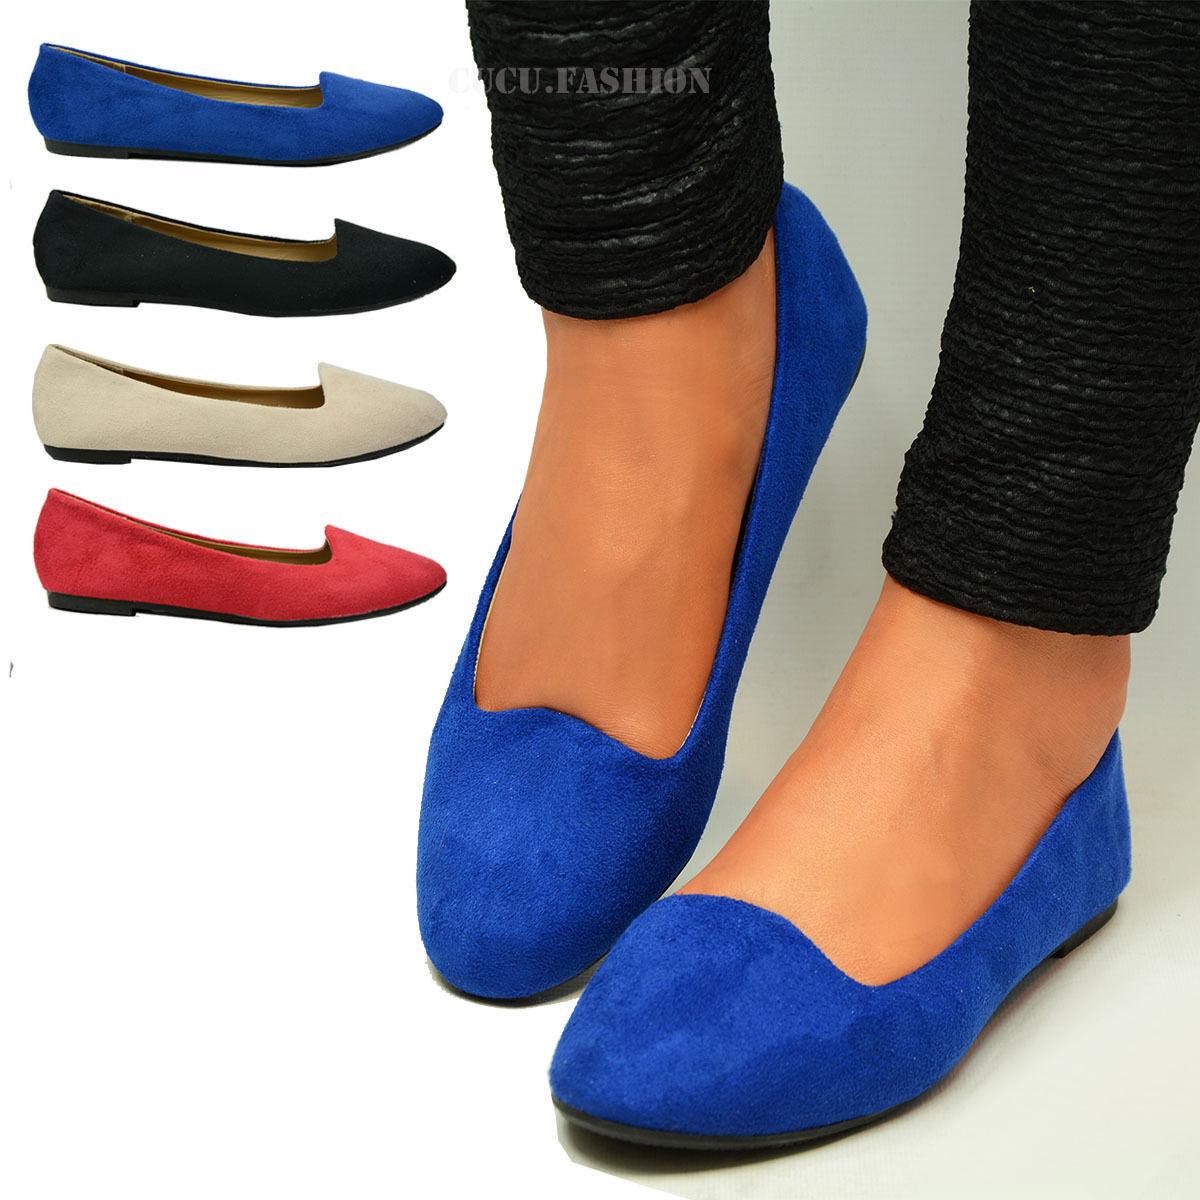 Mujer Negro Plata Azul Flats Loafers Ballerina zapatos Ballet Ladies Dolly Pumps zapatos Ballerina a6bb39